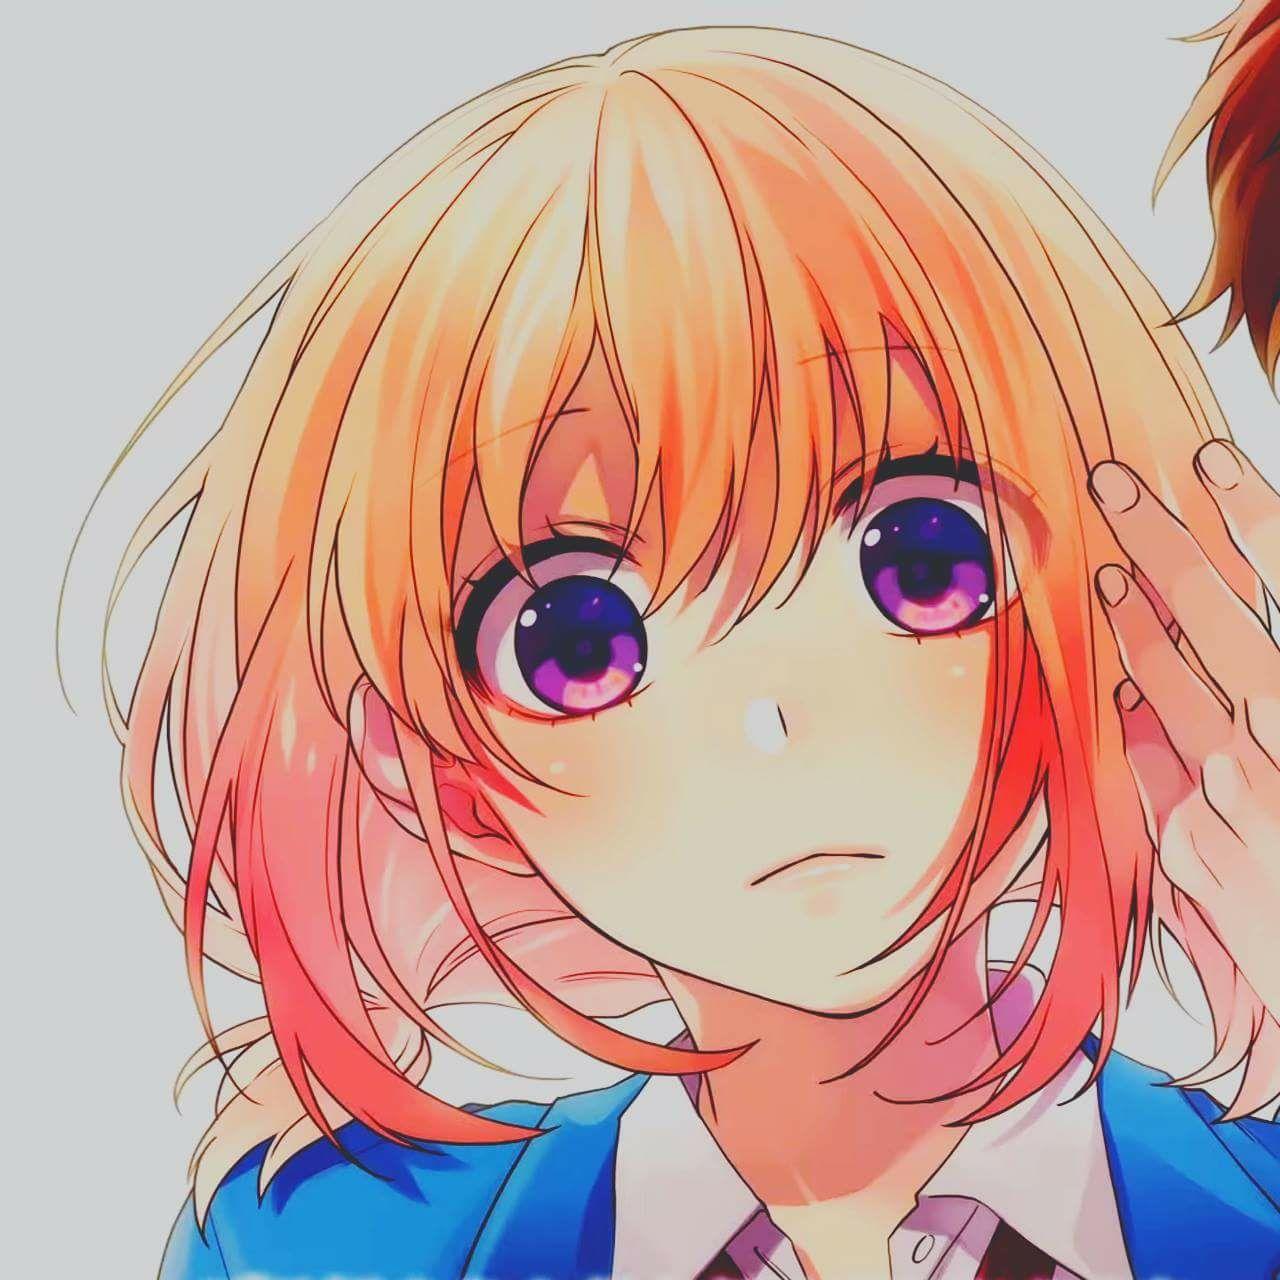 Matching Icons in 2020 Aesthetic anime, Anime art girl